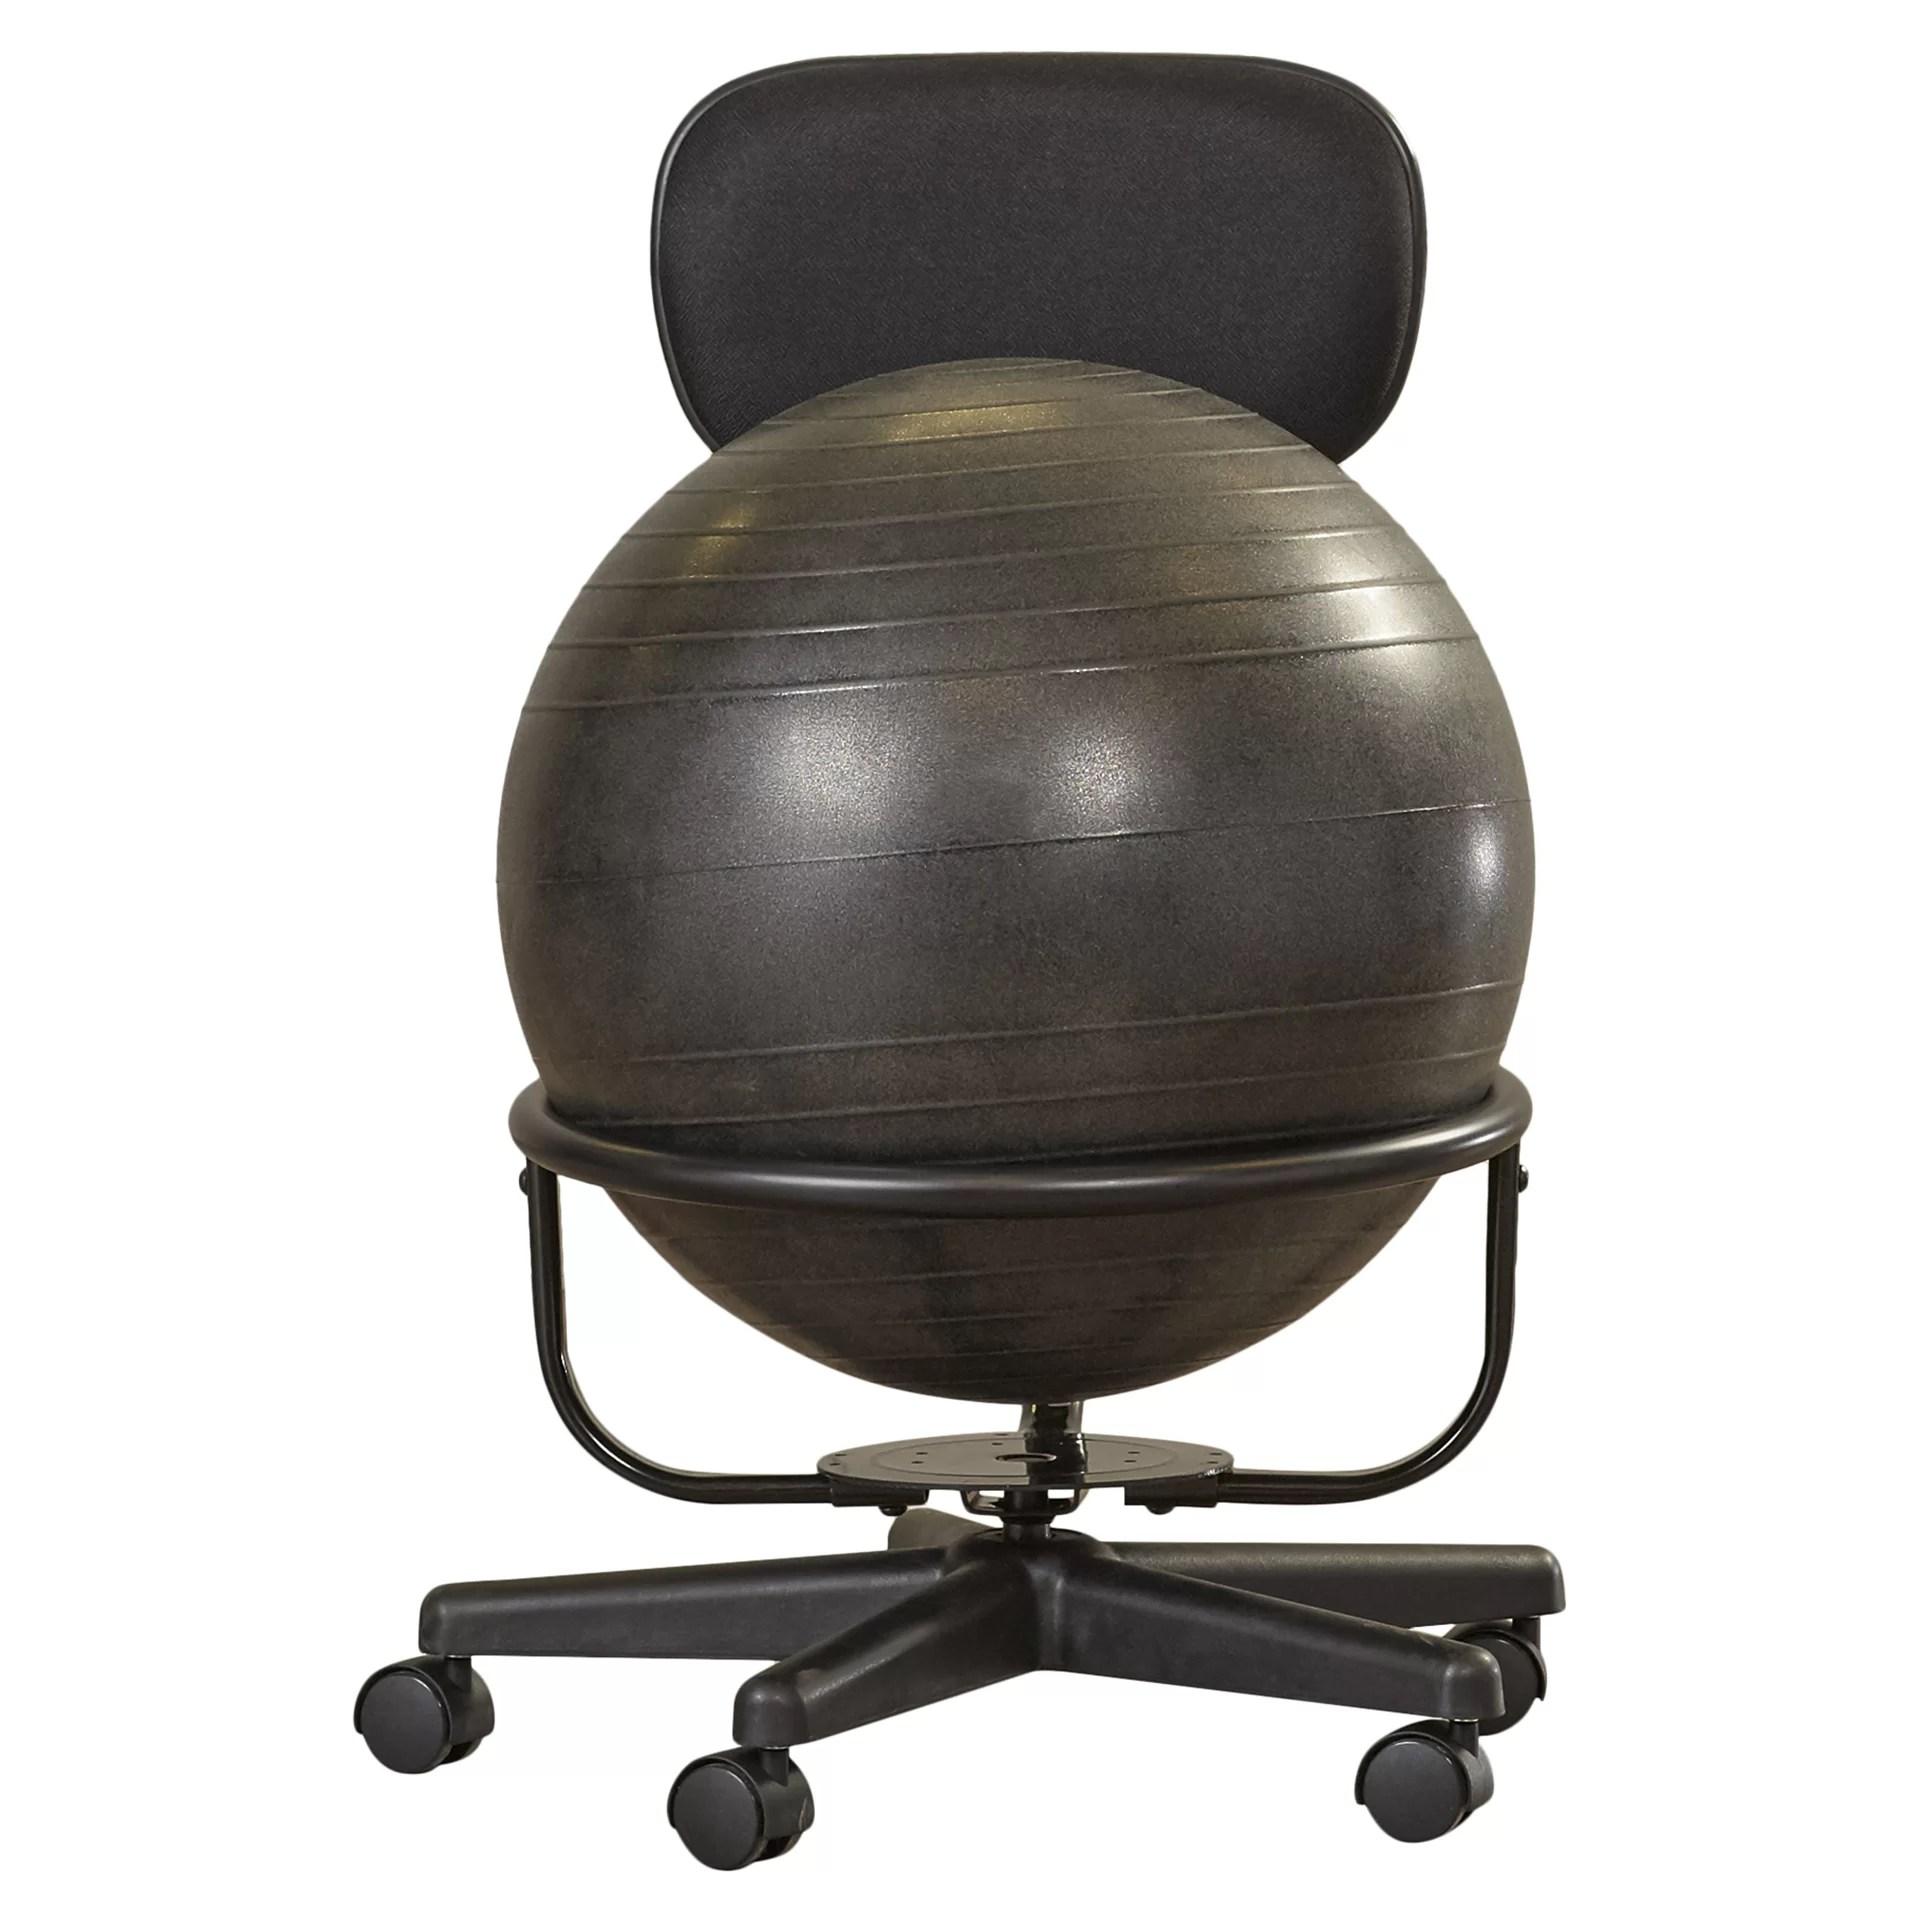 Symple Stuff Exercise Ball Chair  Reviews  Wayfairca